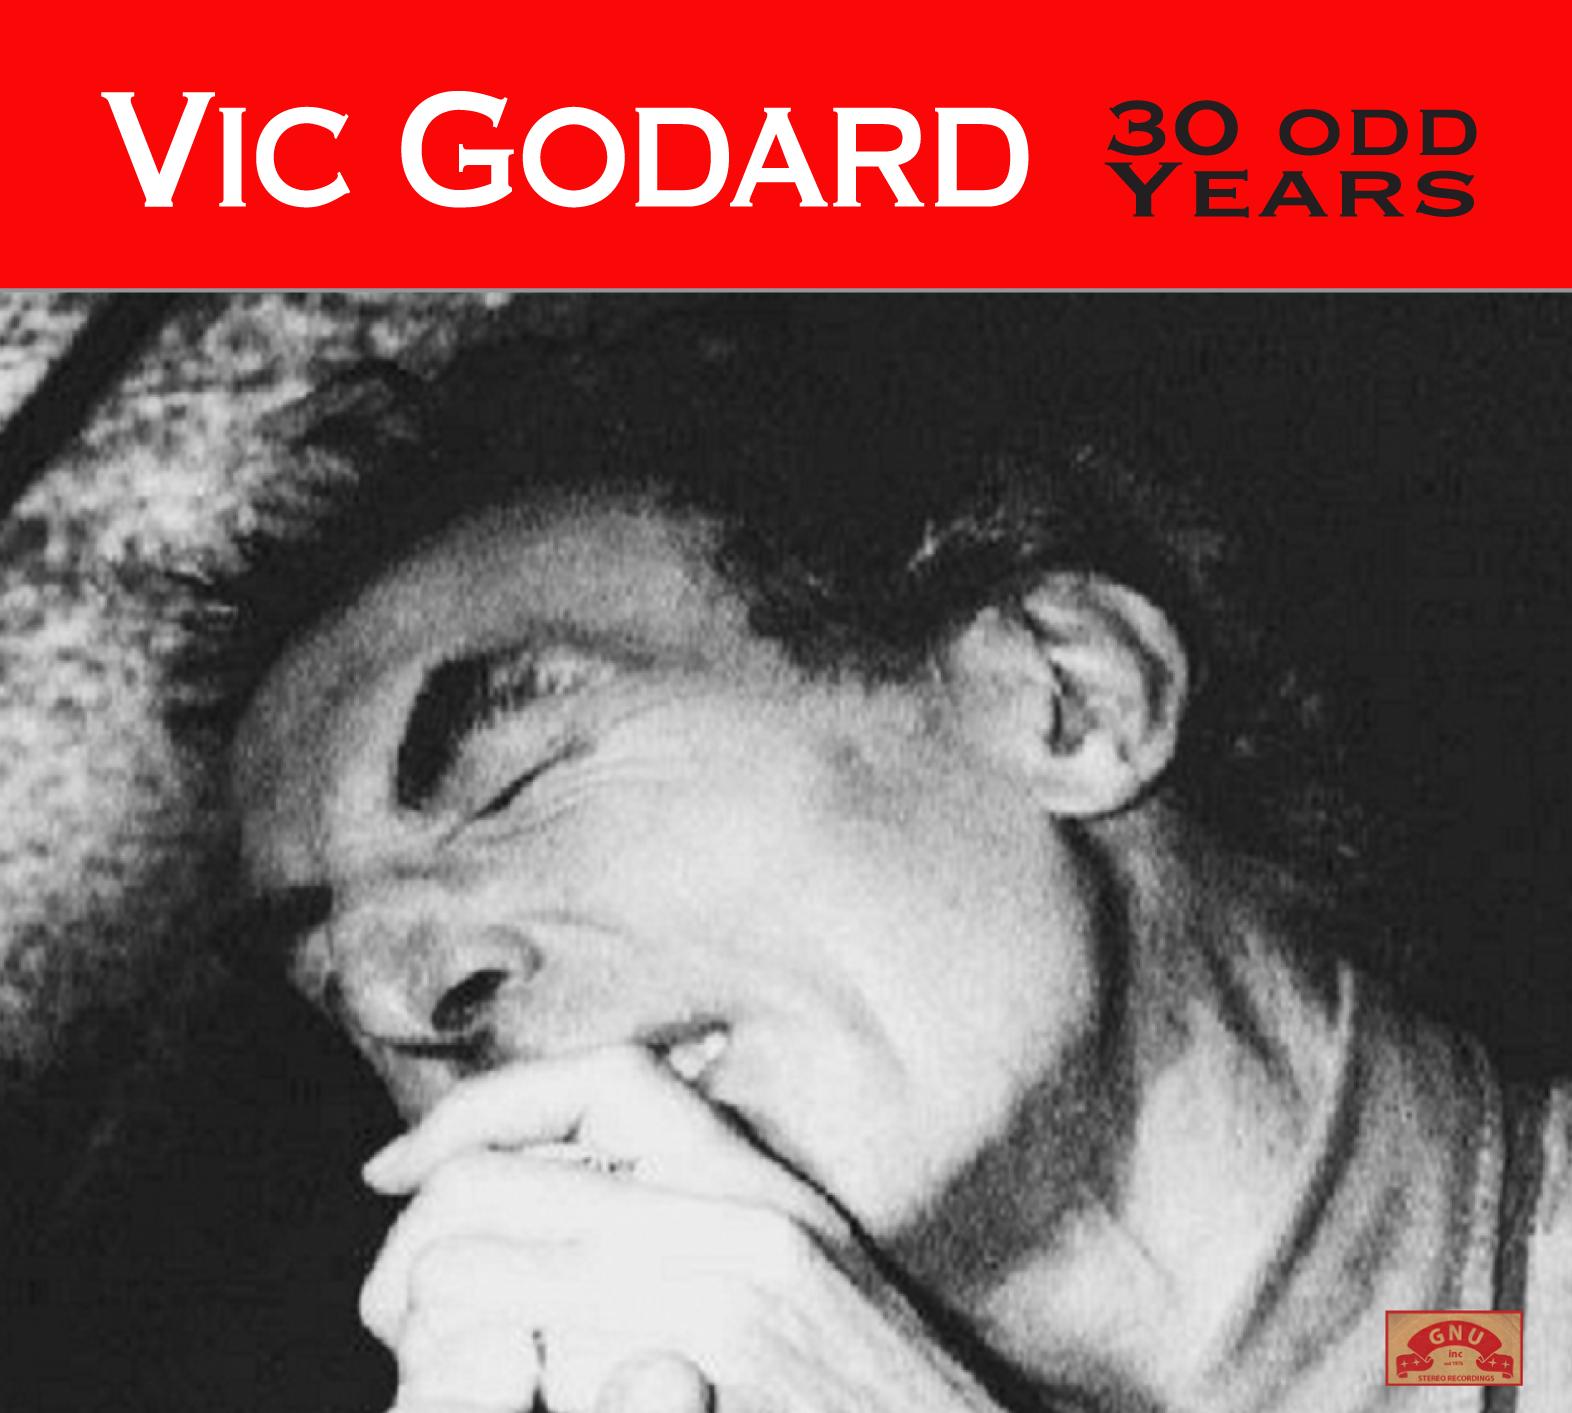 vic godard 30 odd years cover.jpg